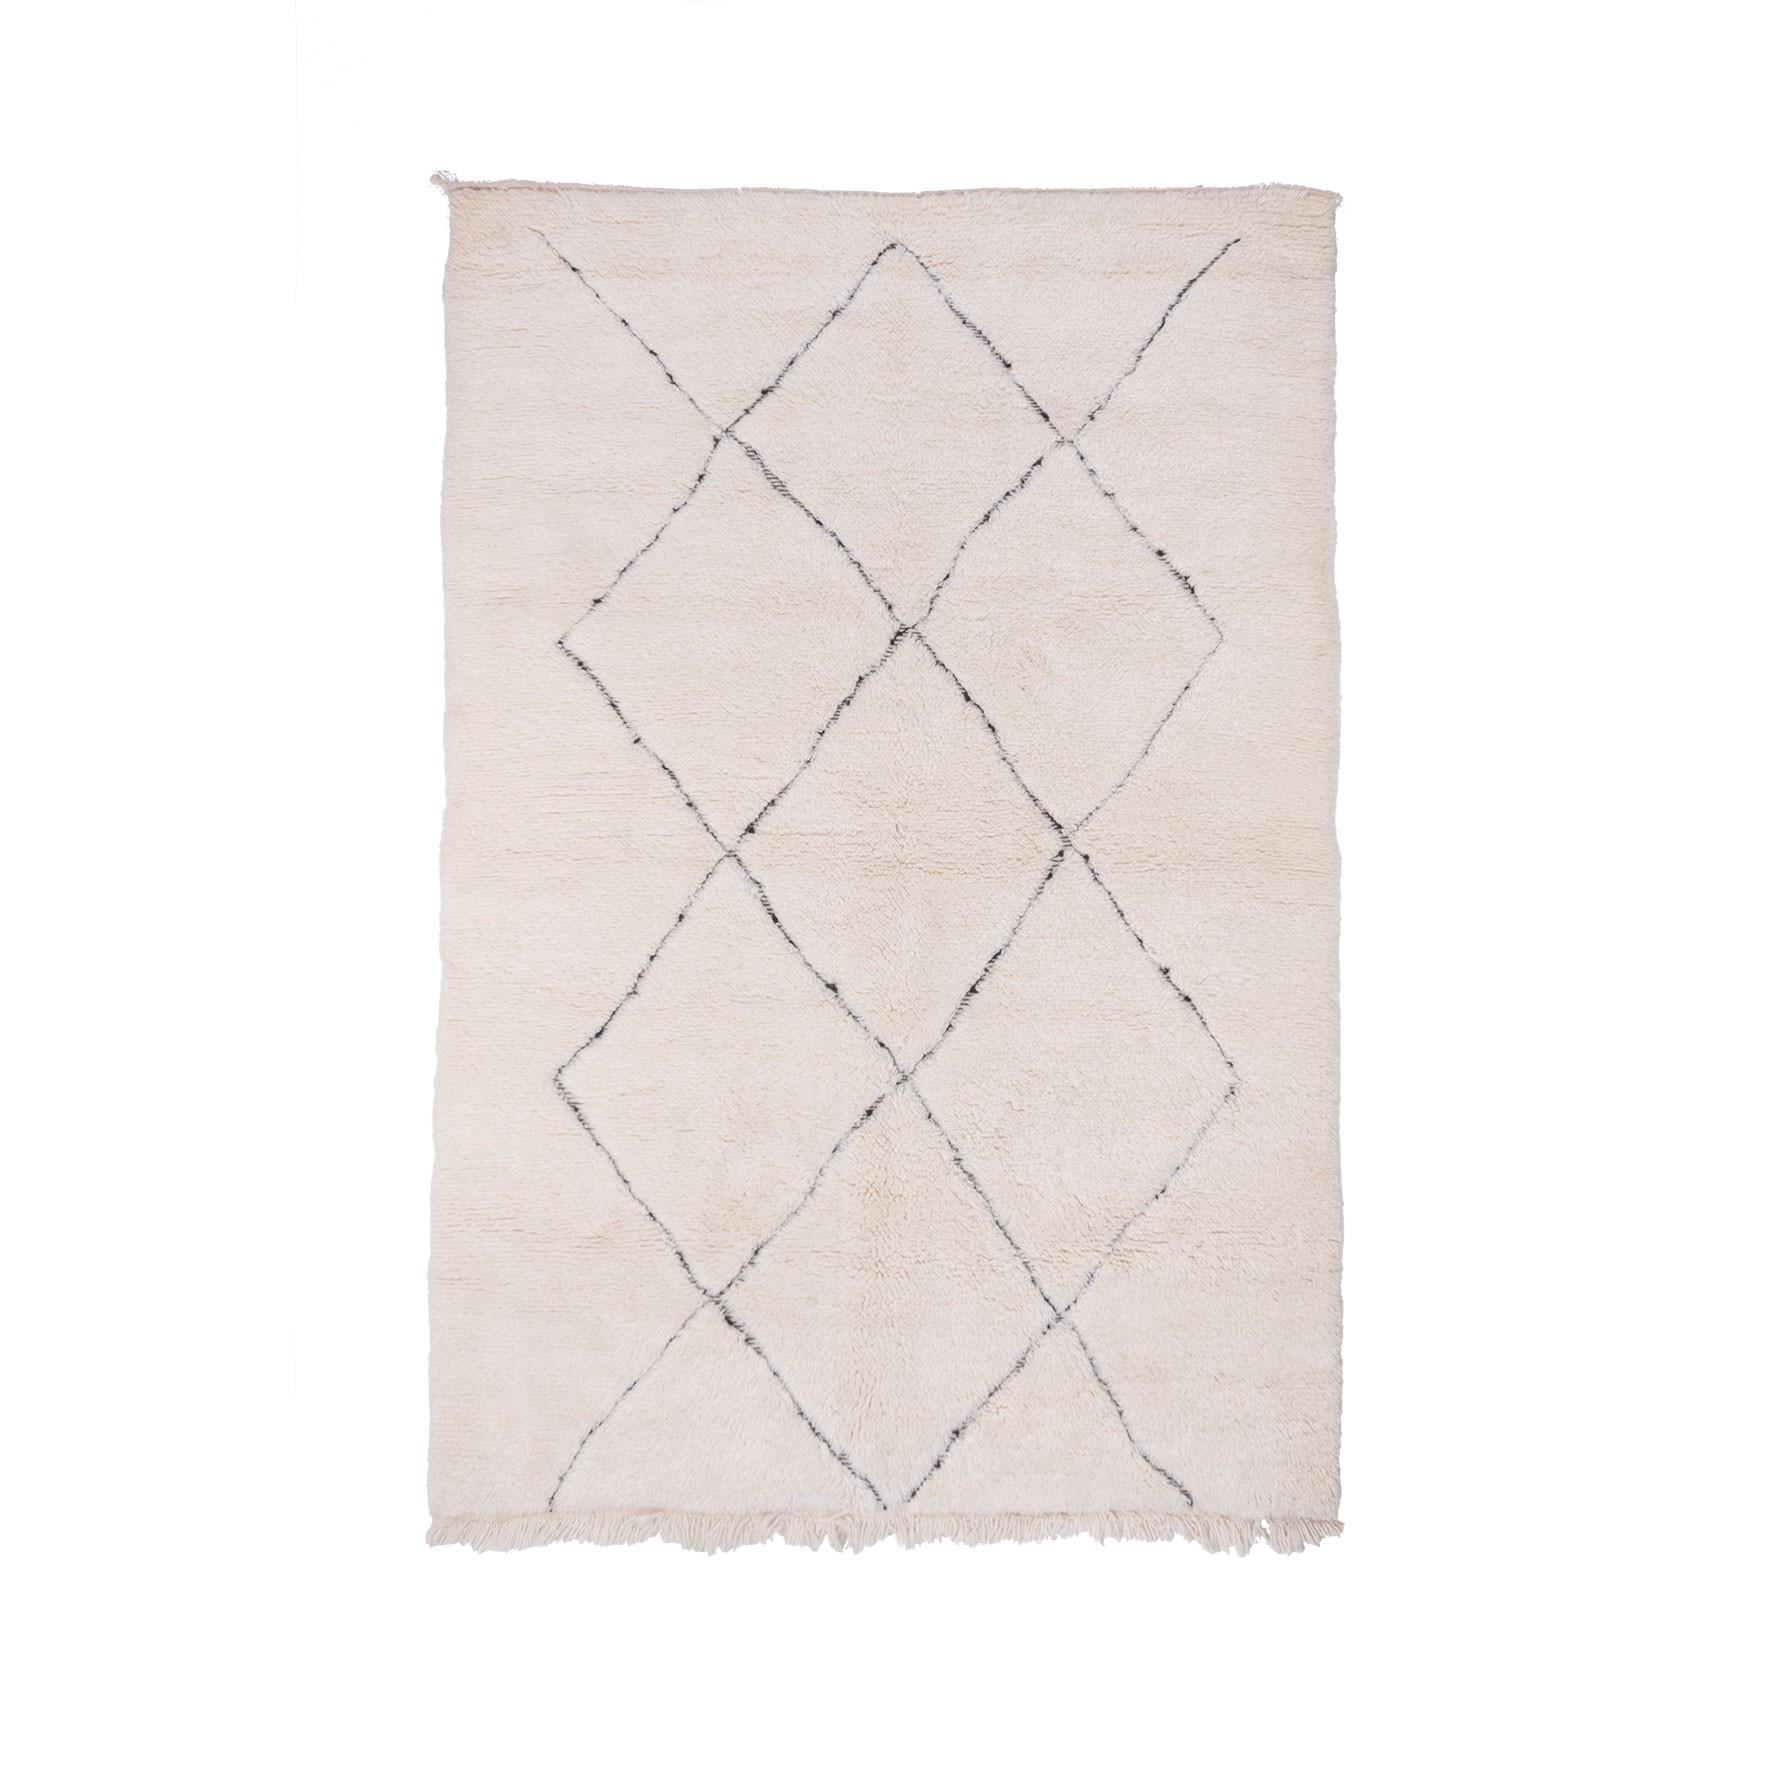 Beni Ouarain carpet 7 full diamonds gray / black outline